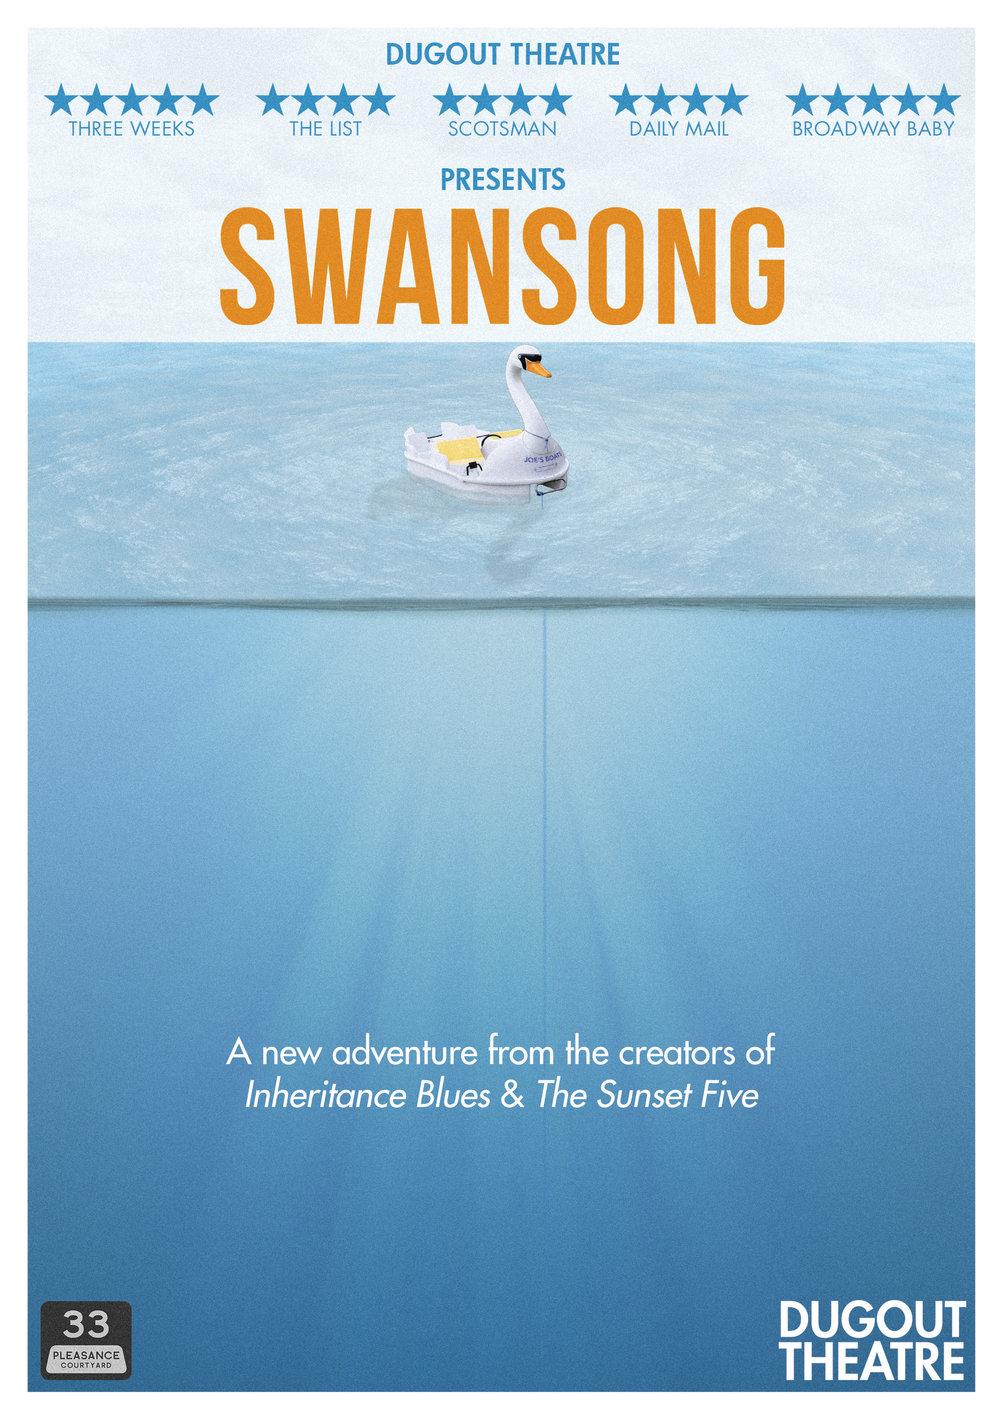 swansong flyer front.jpg